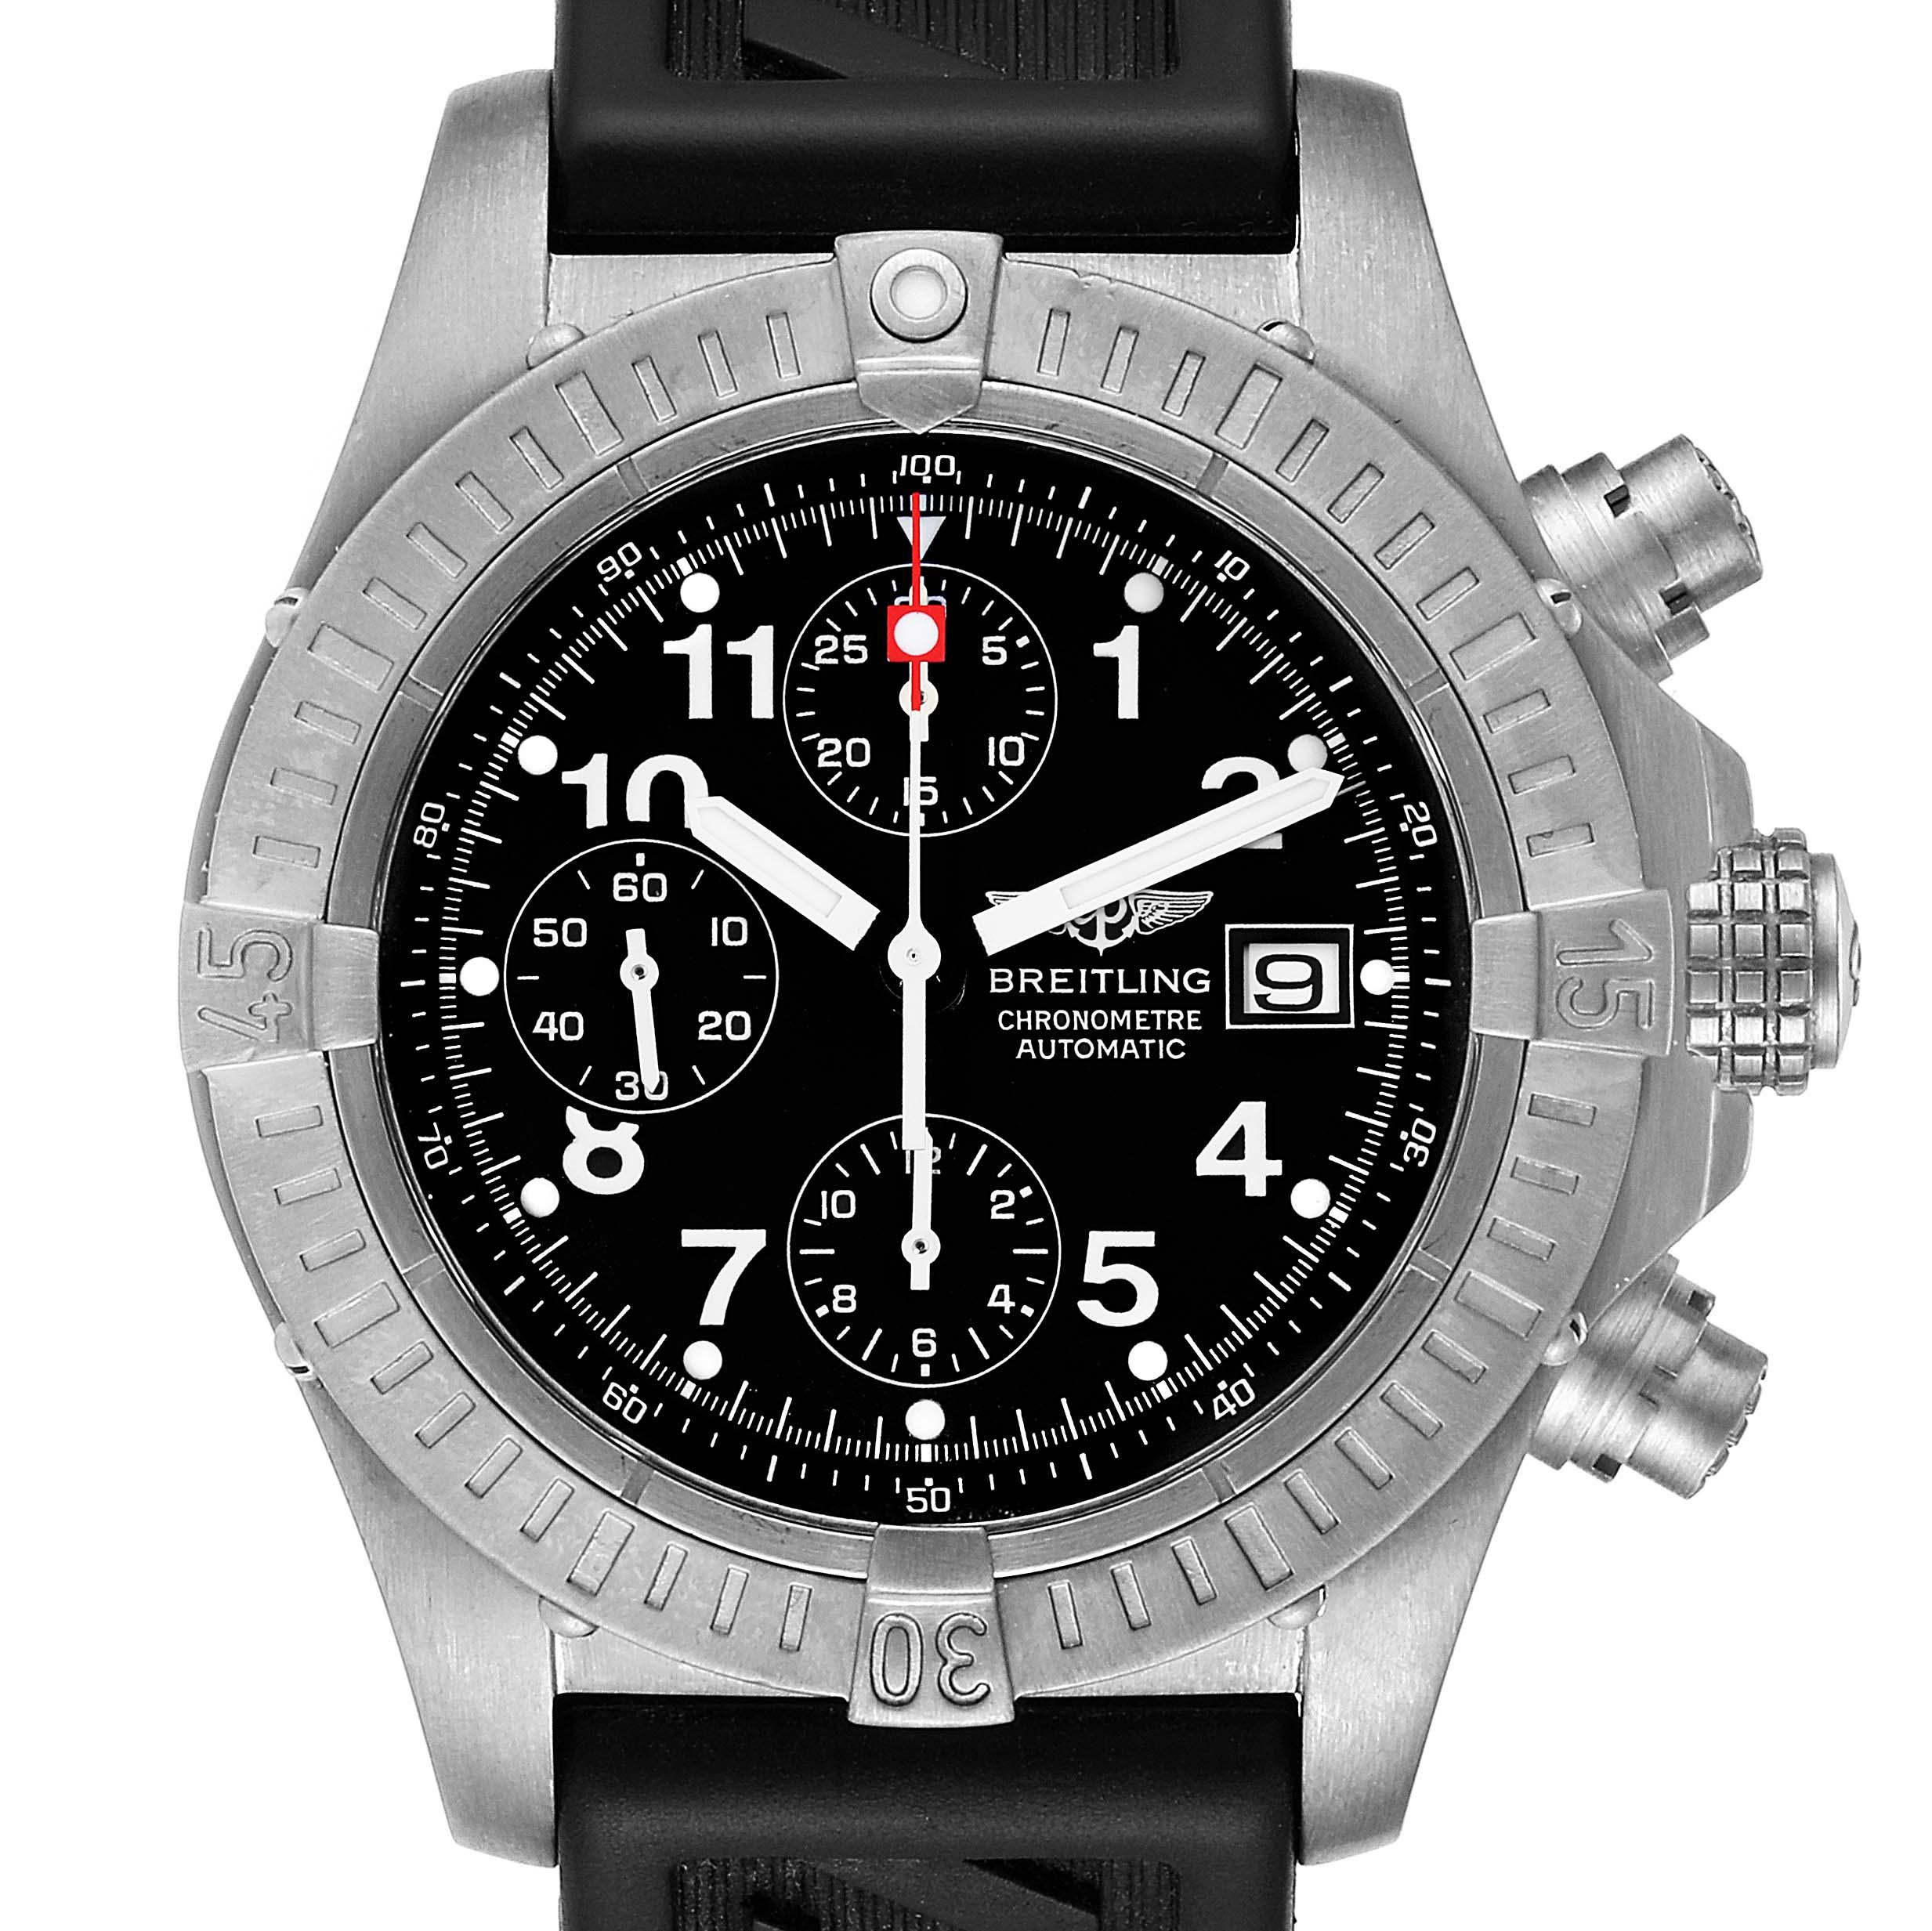 Photo of Breitling Avenger Black Dial Chronograph Titanium Watch E13360 Box